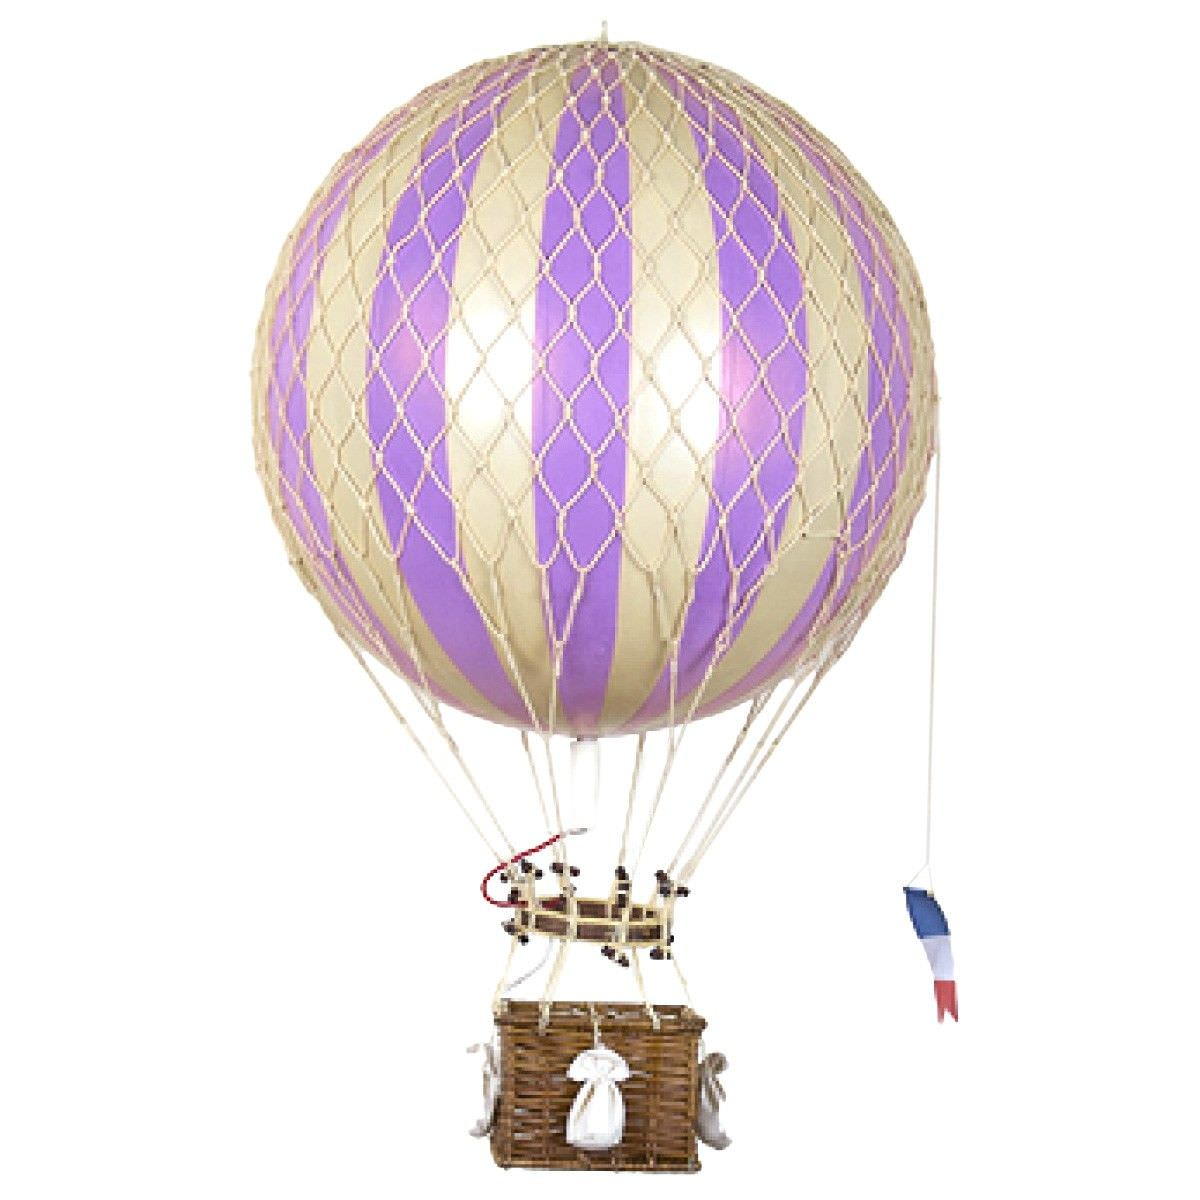 Royal Aero Hot Air Balloon Model, Lavender